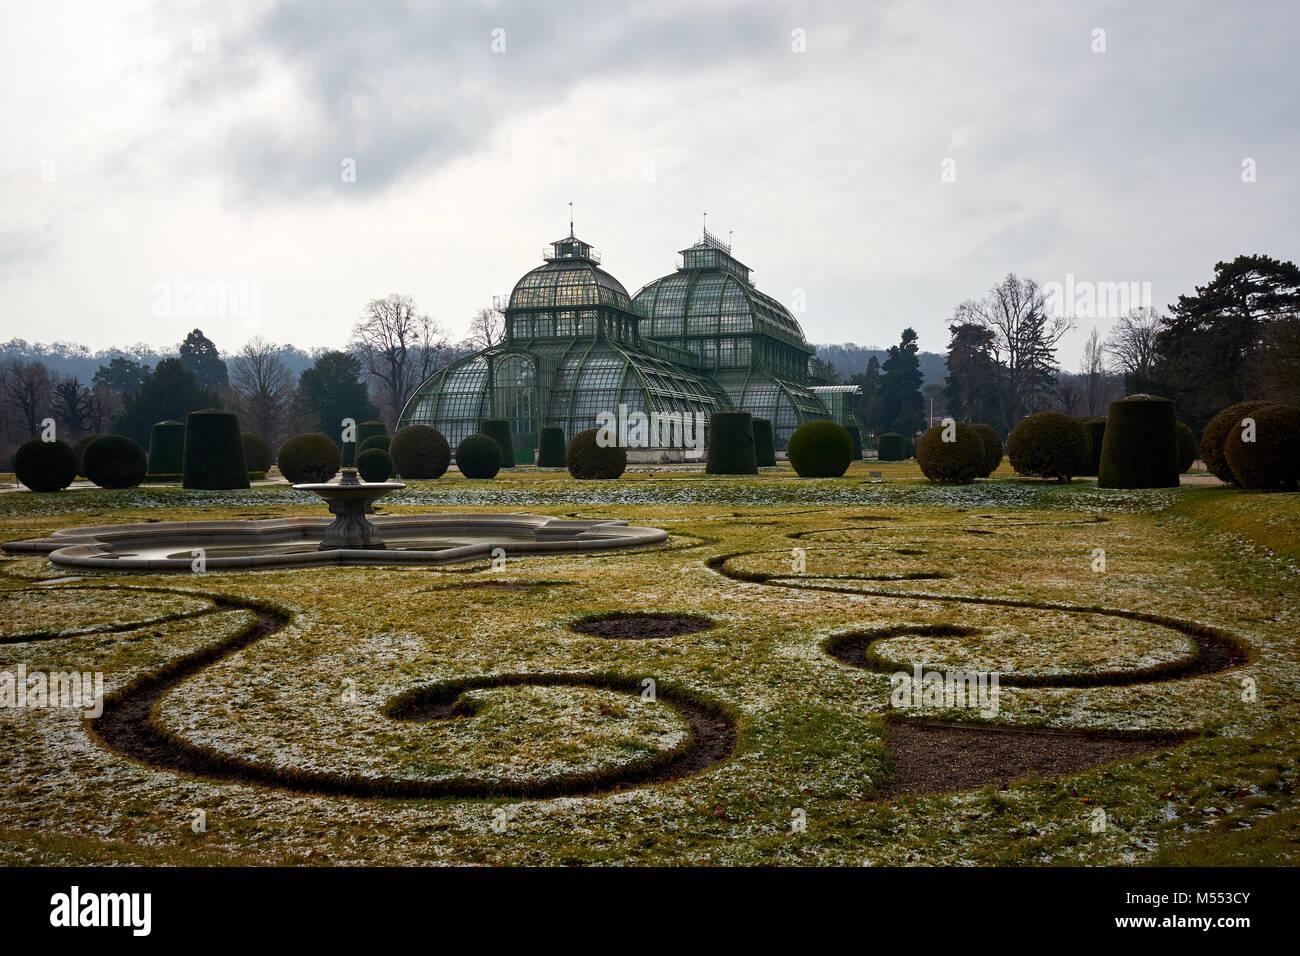 Vienna, Austria - February 18th 2018: The Palmenhaus Schönbrunn / Schönbrunn palm house in the grounds - Stock Image